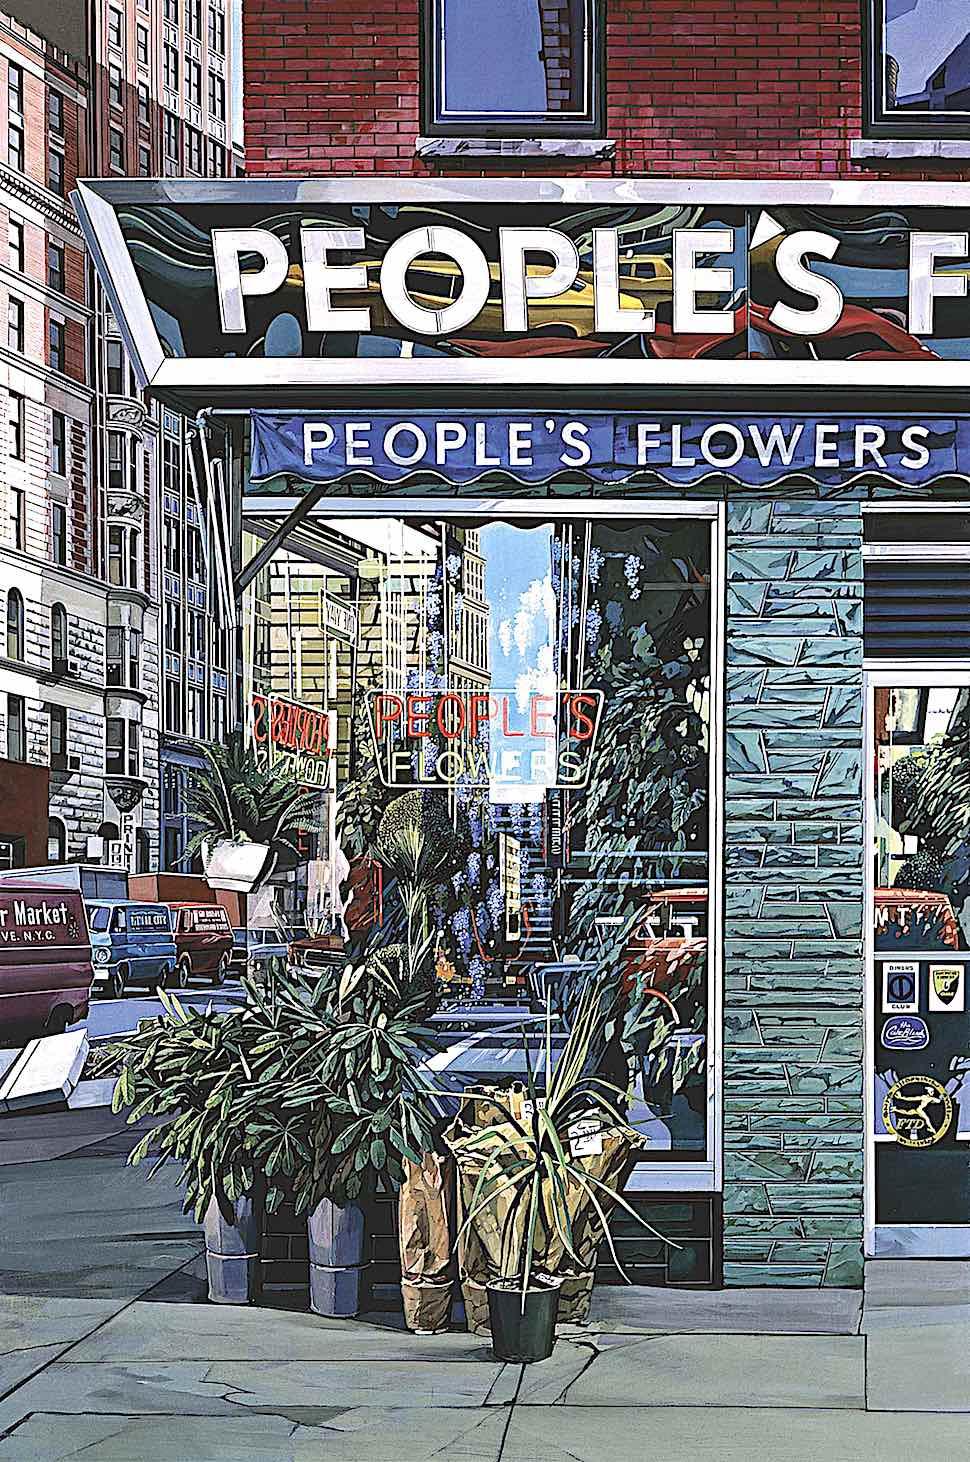 a Richard Estes painting of an urban flower store